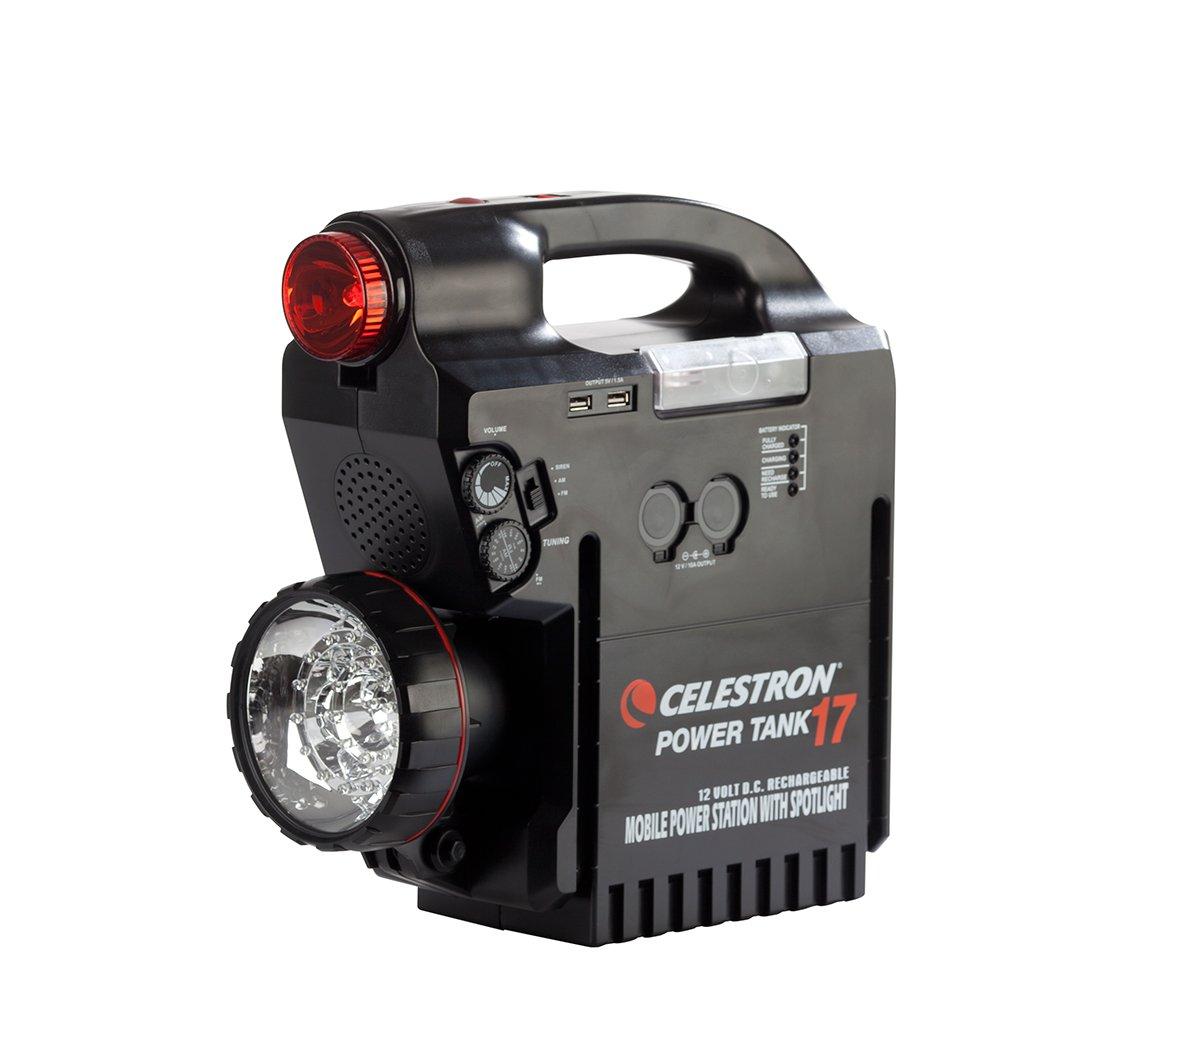 Celestron Celestron Rechargeable Power Supply PowerTank 17, 12v 17Ah, Black (18777) by Celestron